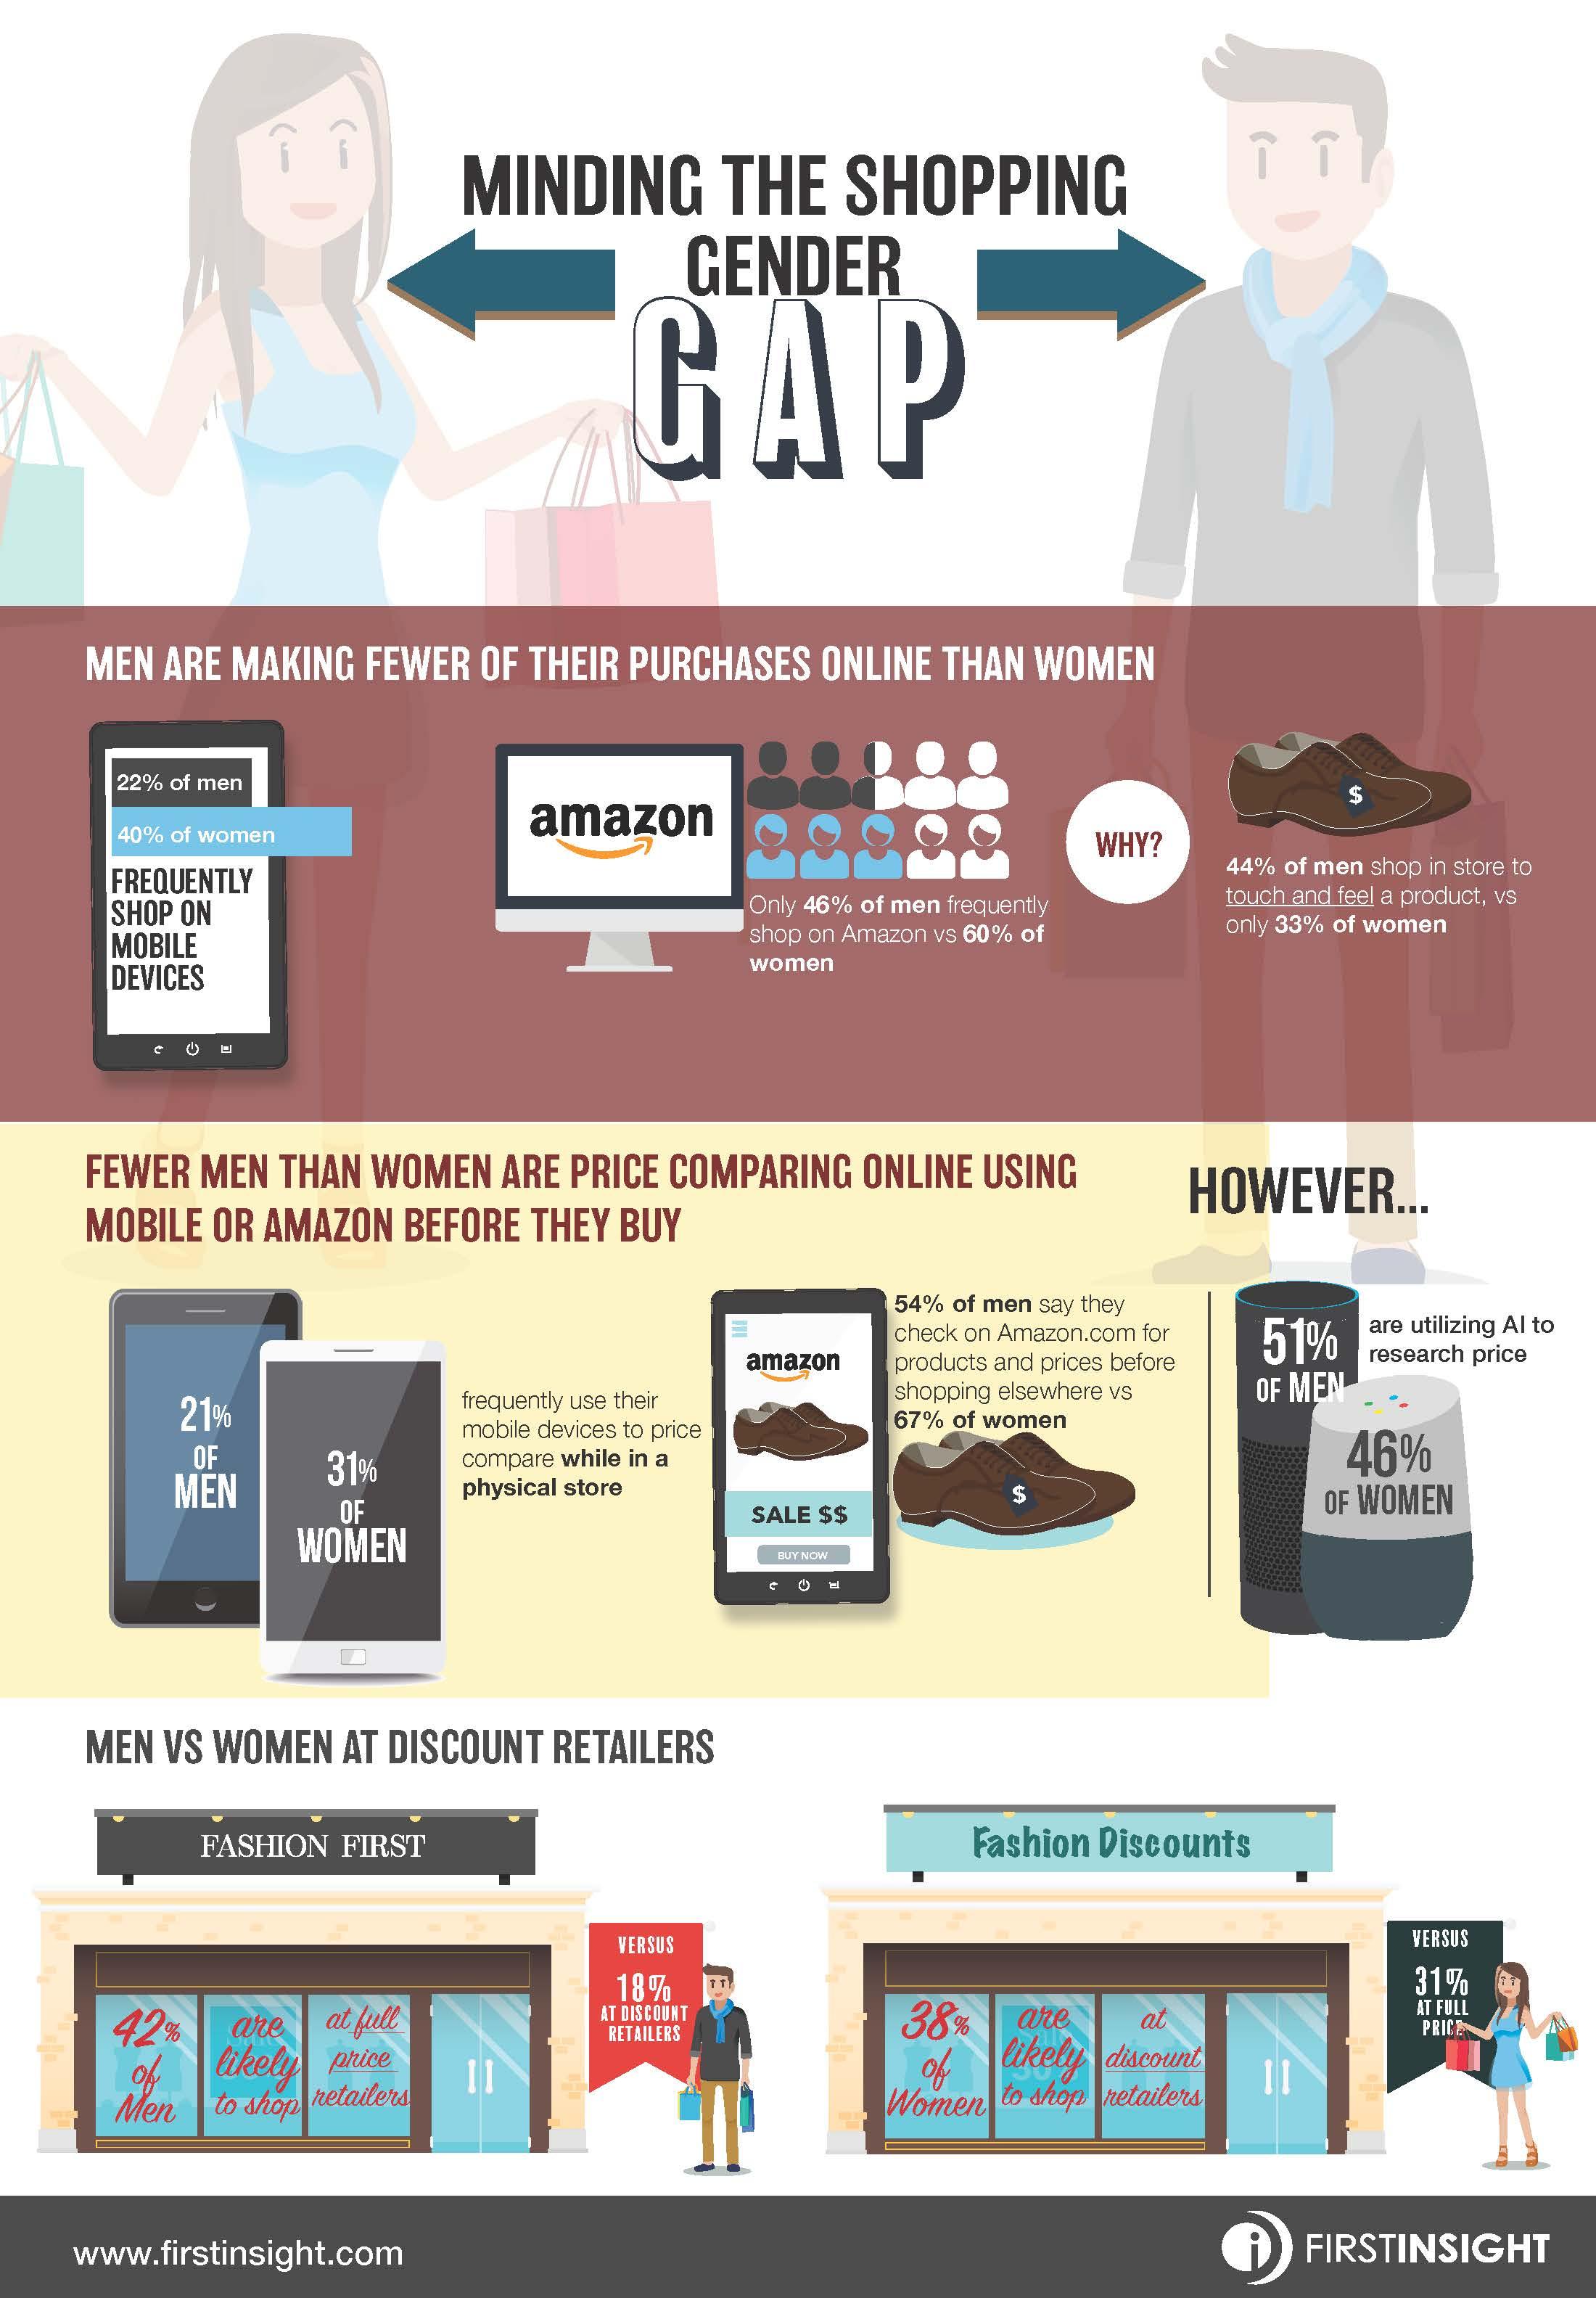 Men Aren't Willing To Shop Online As Much As Women, Survey